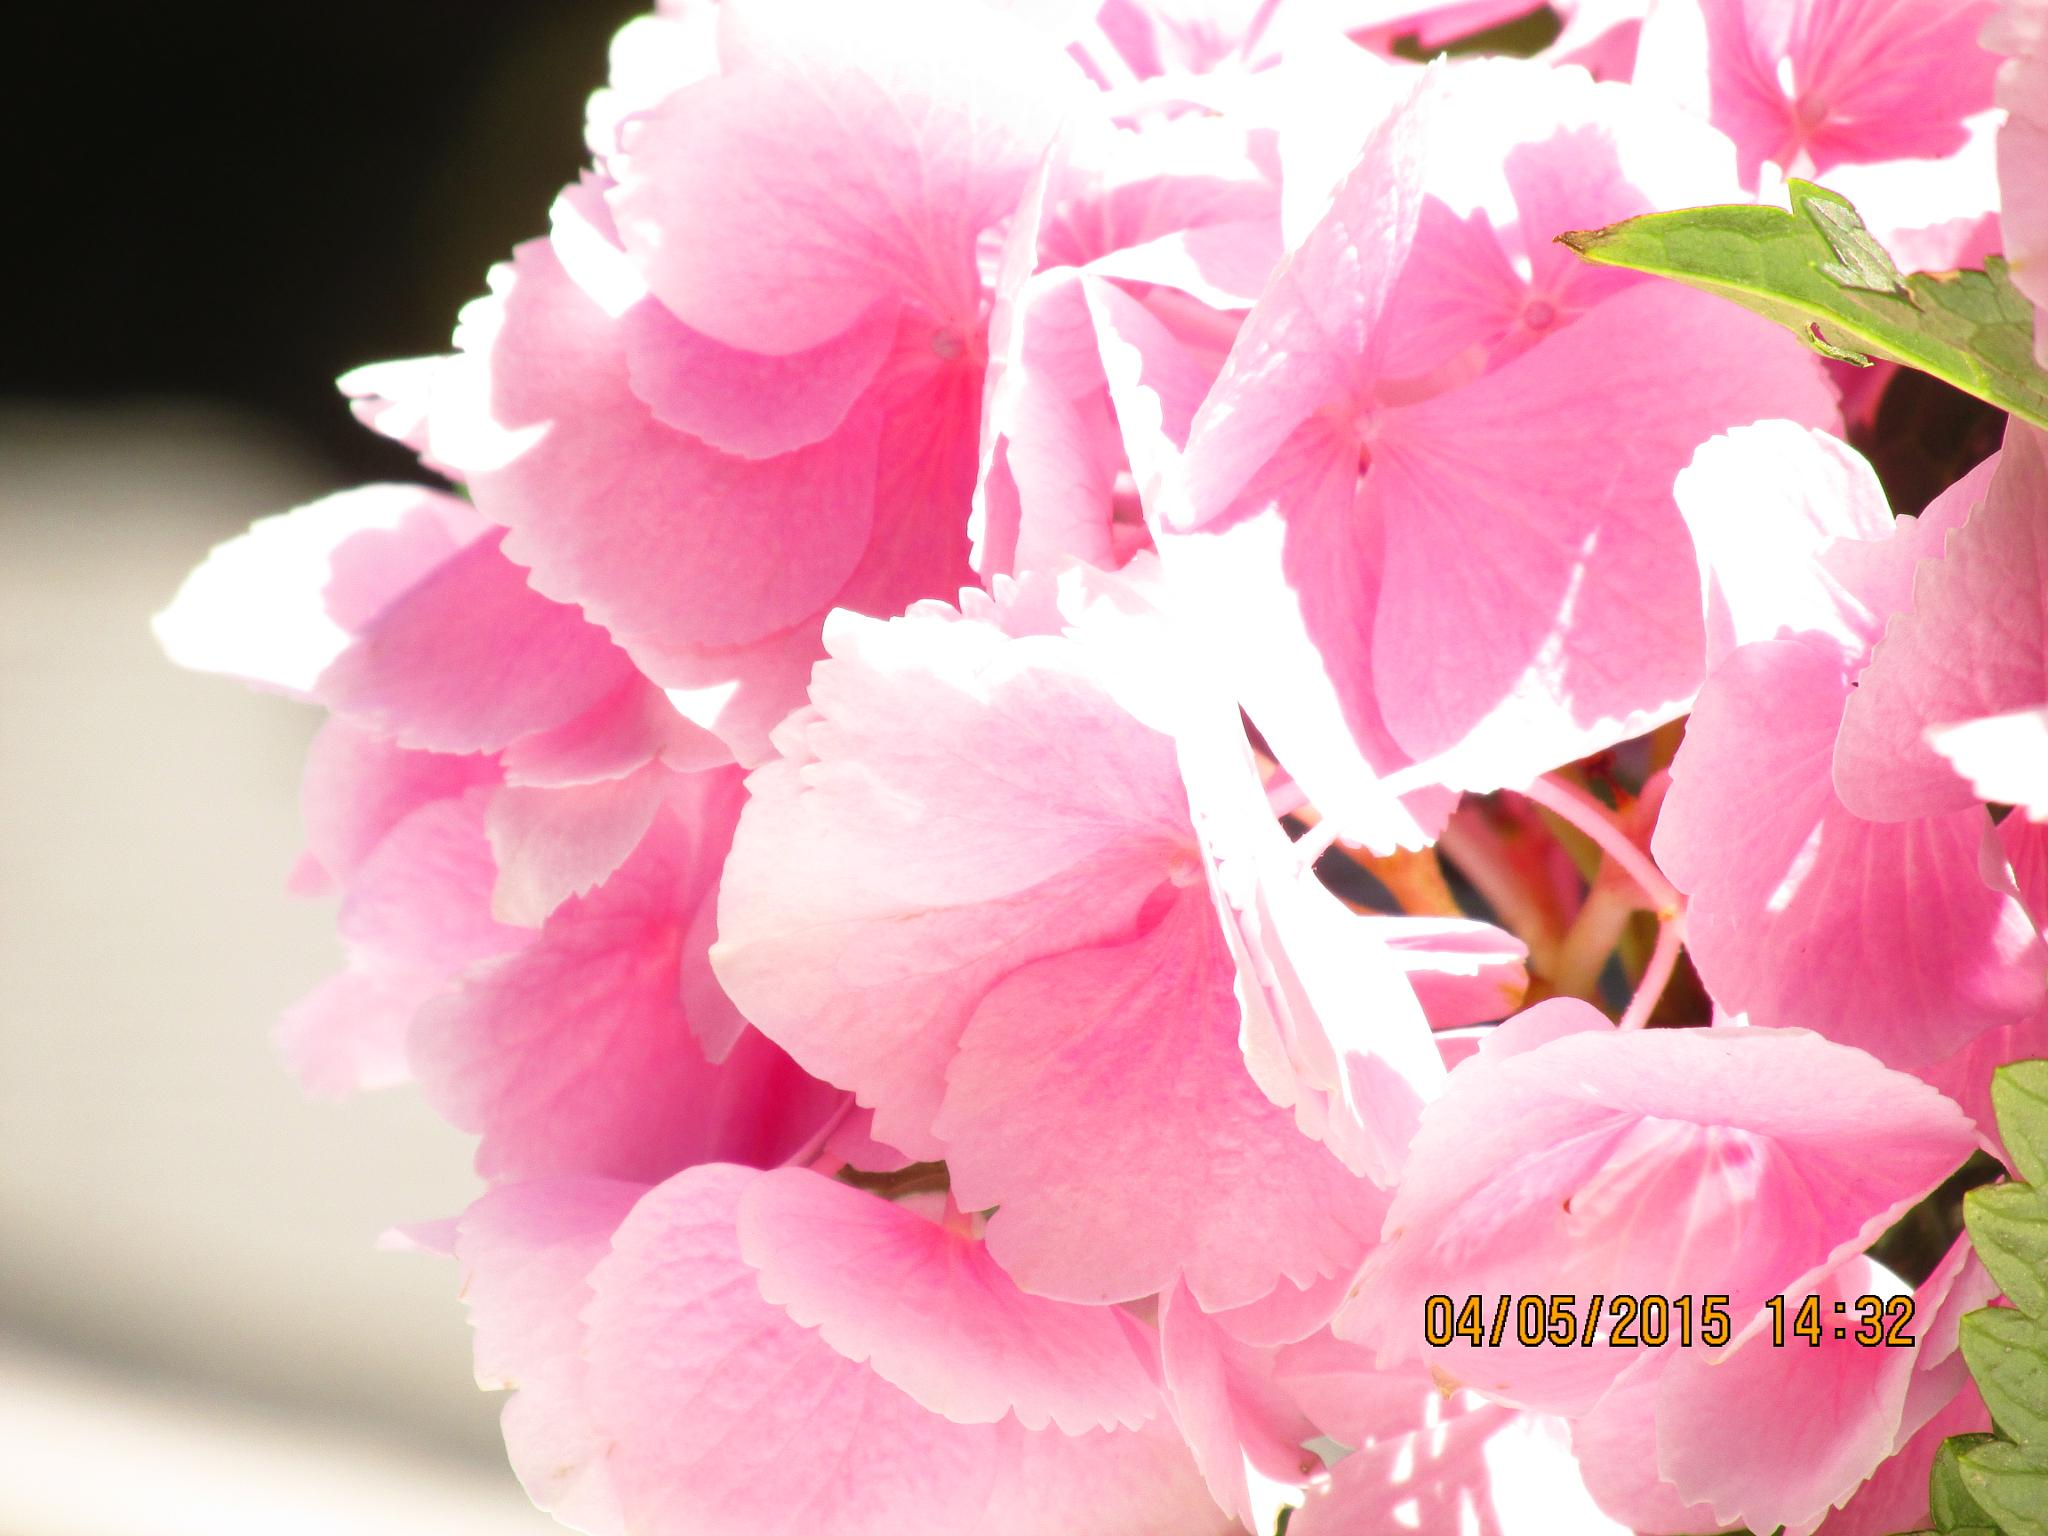 Easter Hydrangea by bj.ameyguckert